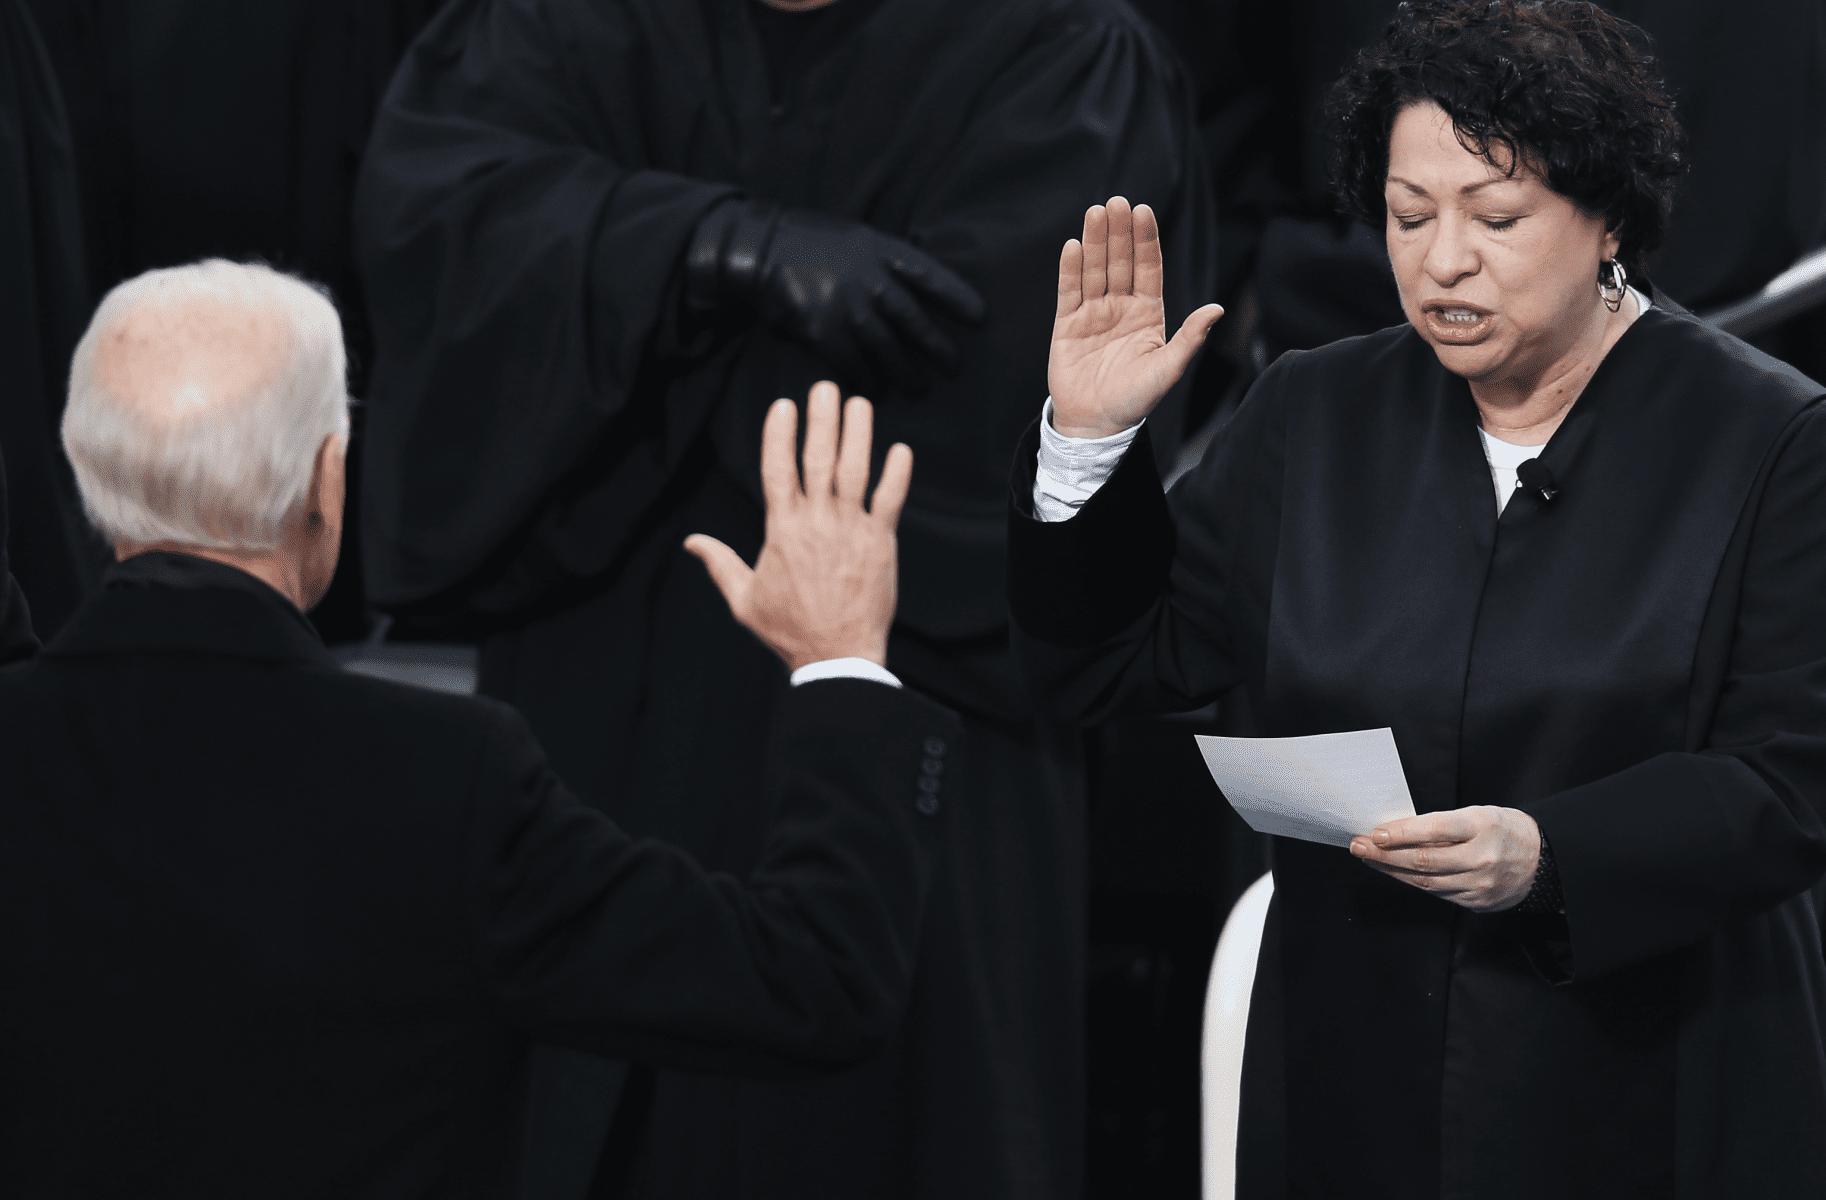 Justice Sonia Sotomayor and Vice President Joe Biden